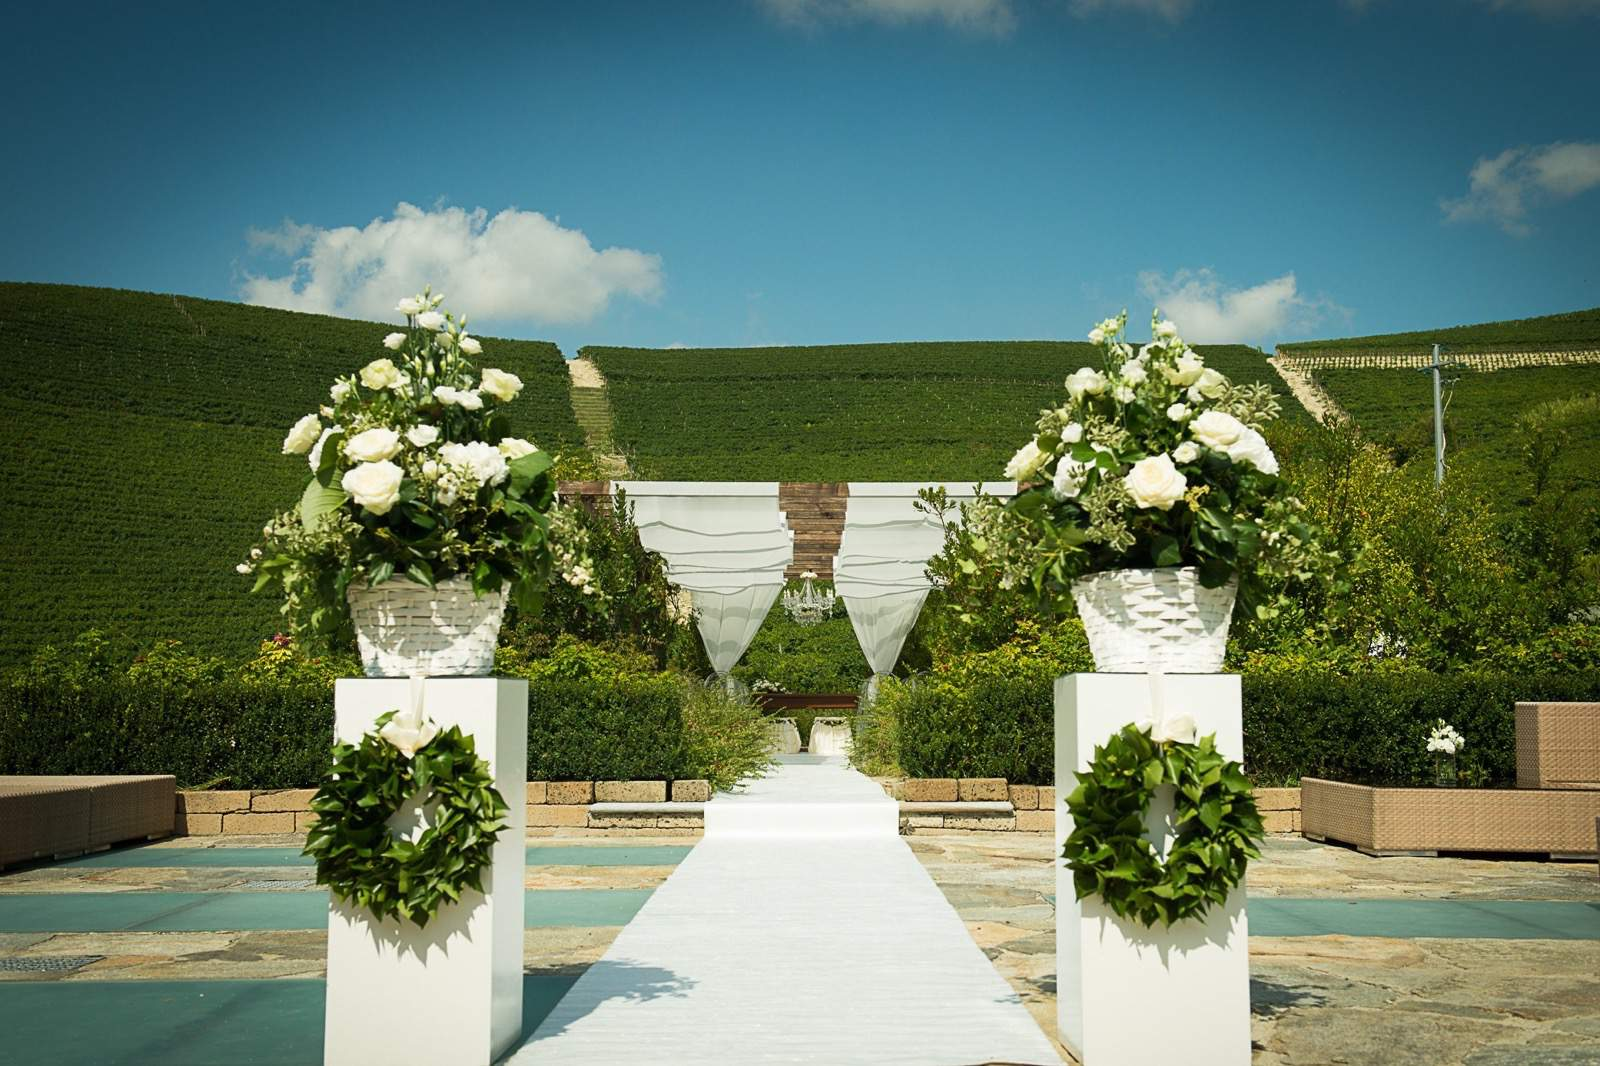 Agriwedding: la nuova frontiera dei matrimoni in Sicilia